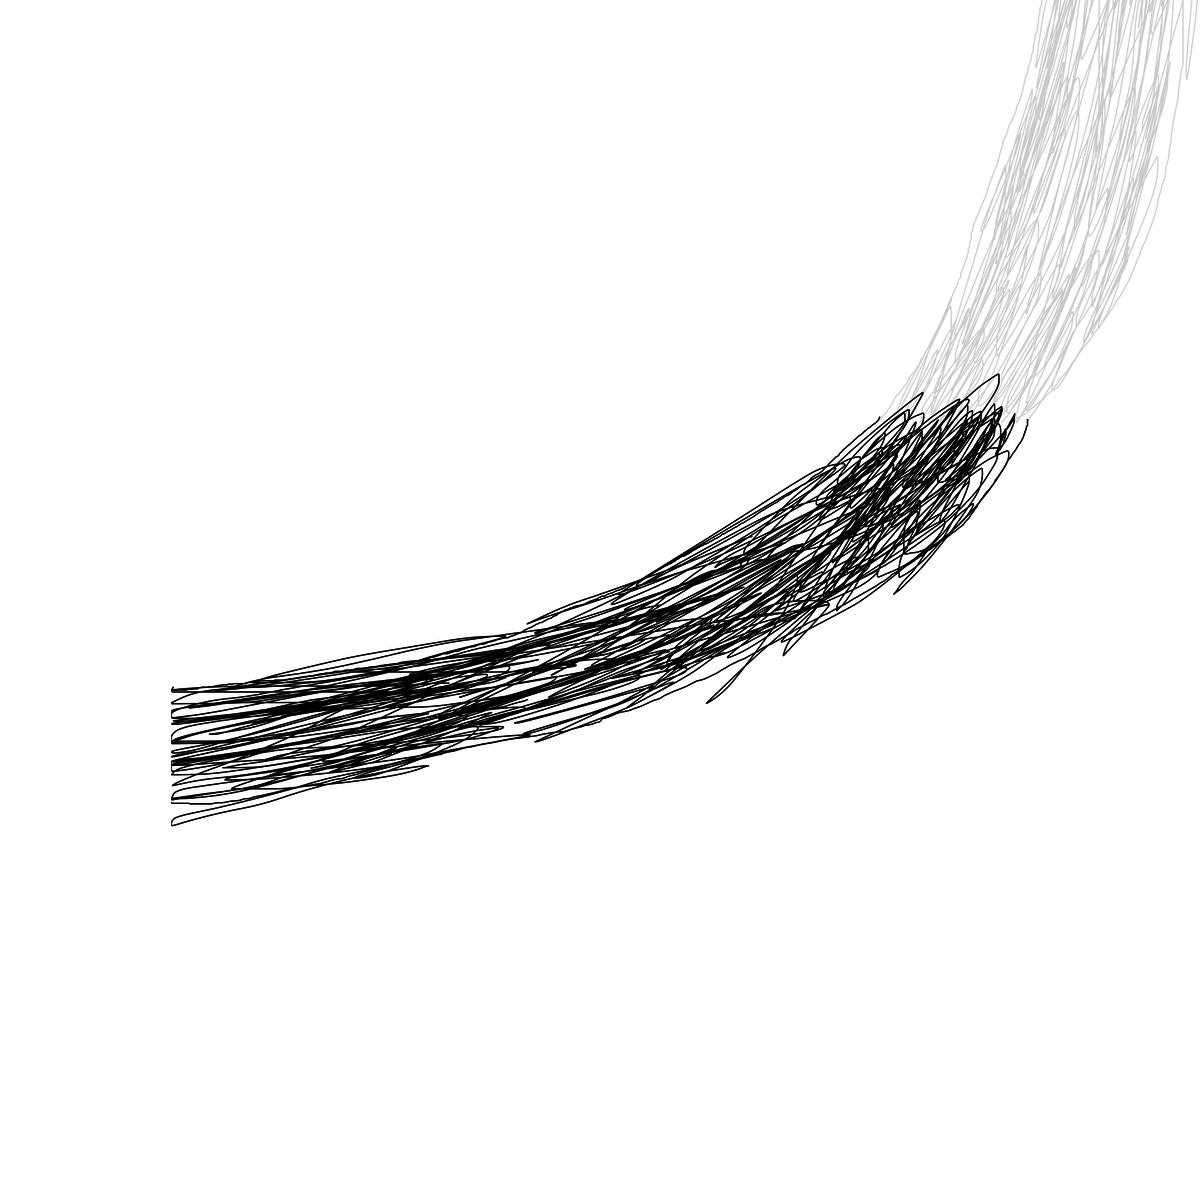 BAAAM drawing#11415 lat:52.4758567810058600lng: 13.4057655334472660